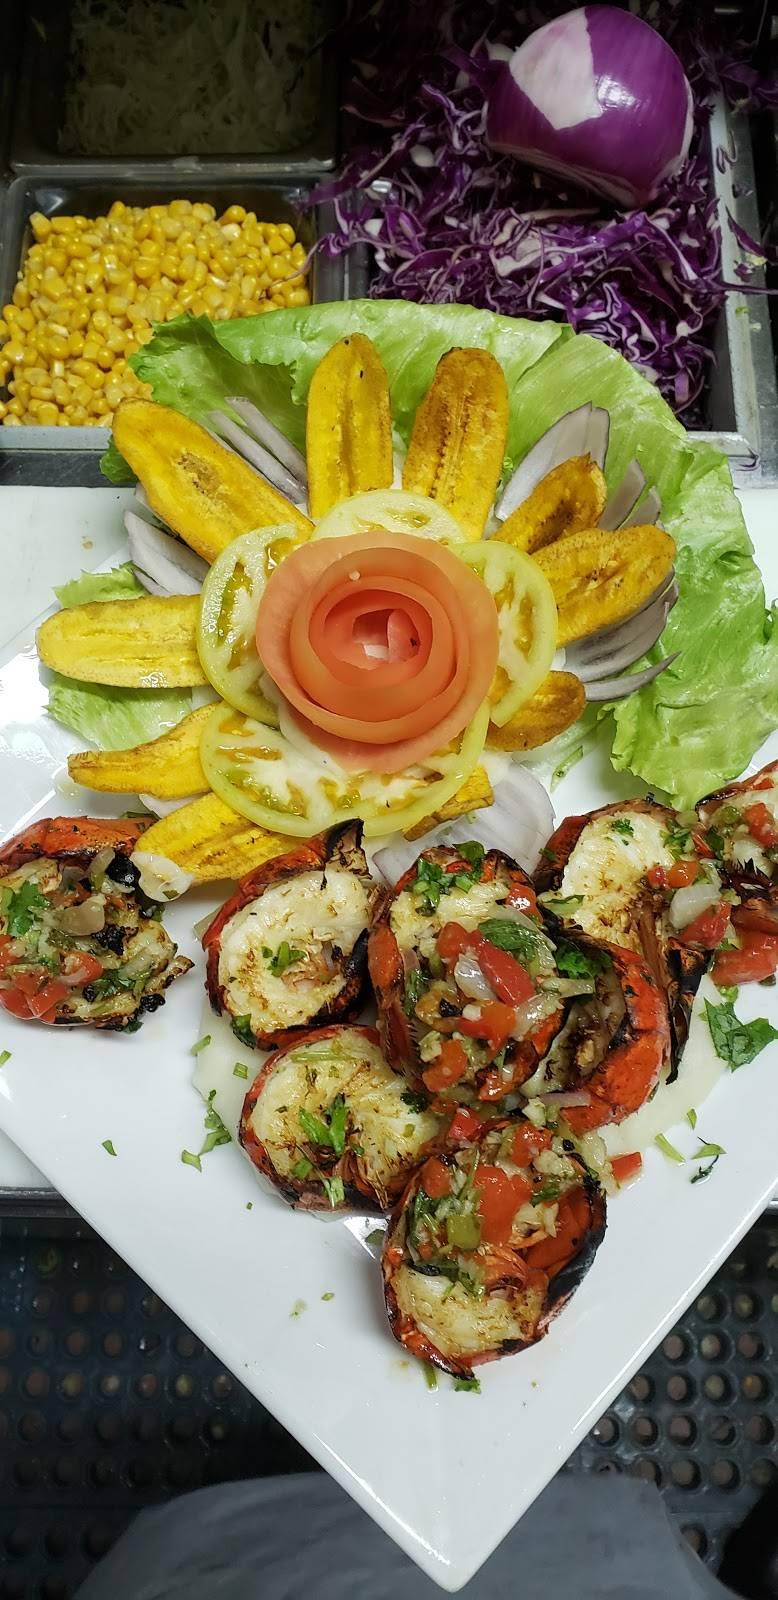 Malecon | restaurant | 4141 Broadway, New York, NY 10033, USA | 2129273812 OR +1 212-927-3812